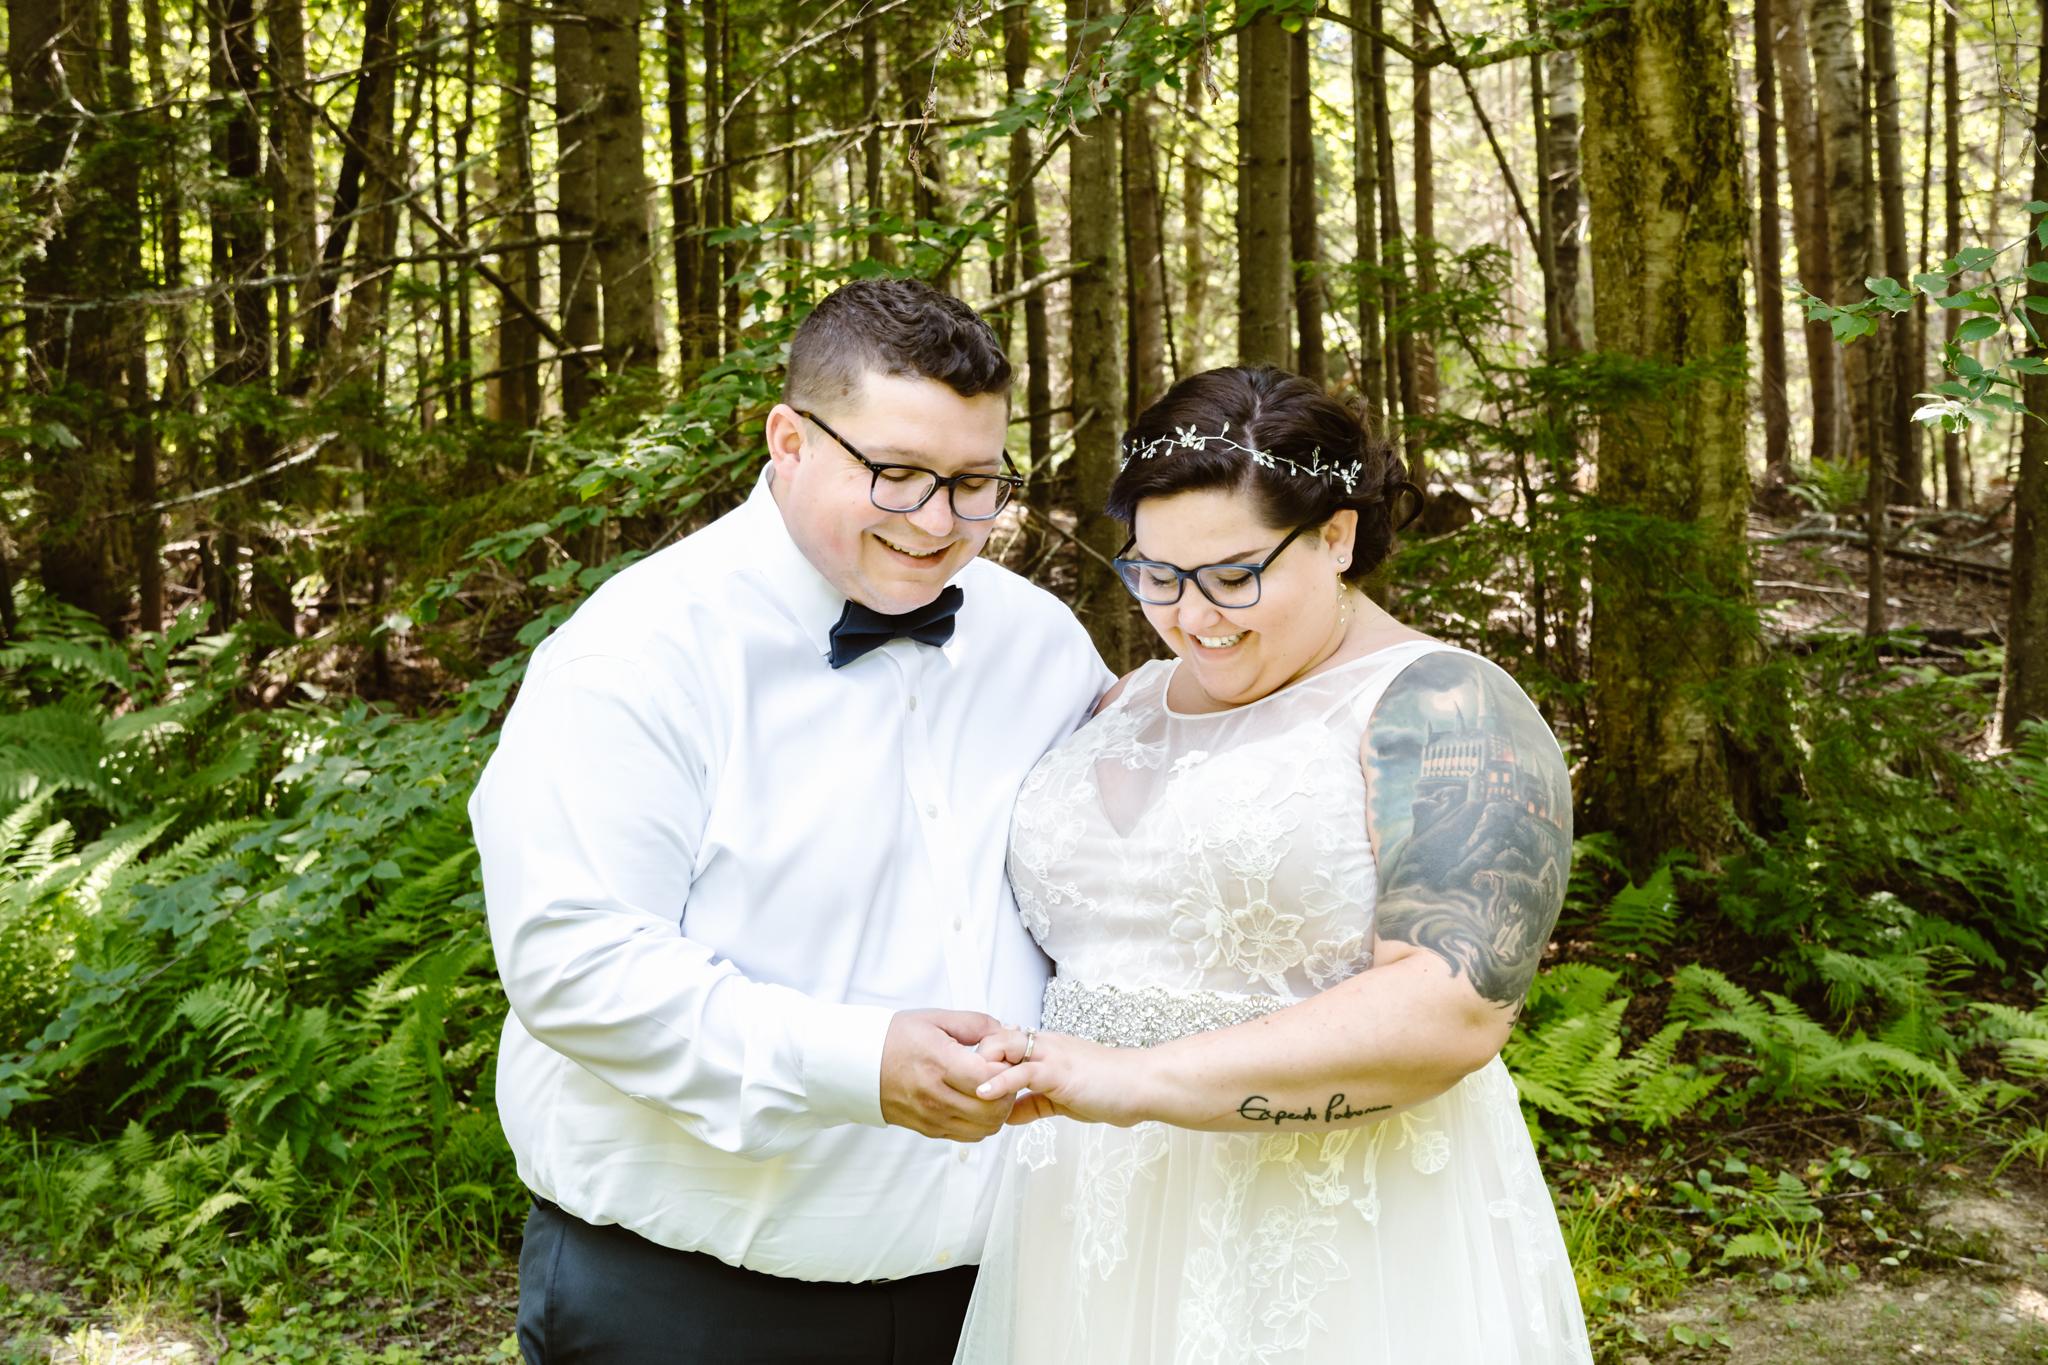 Vermont-Wedding-080119-WEBsize-177.jpg